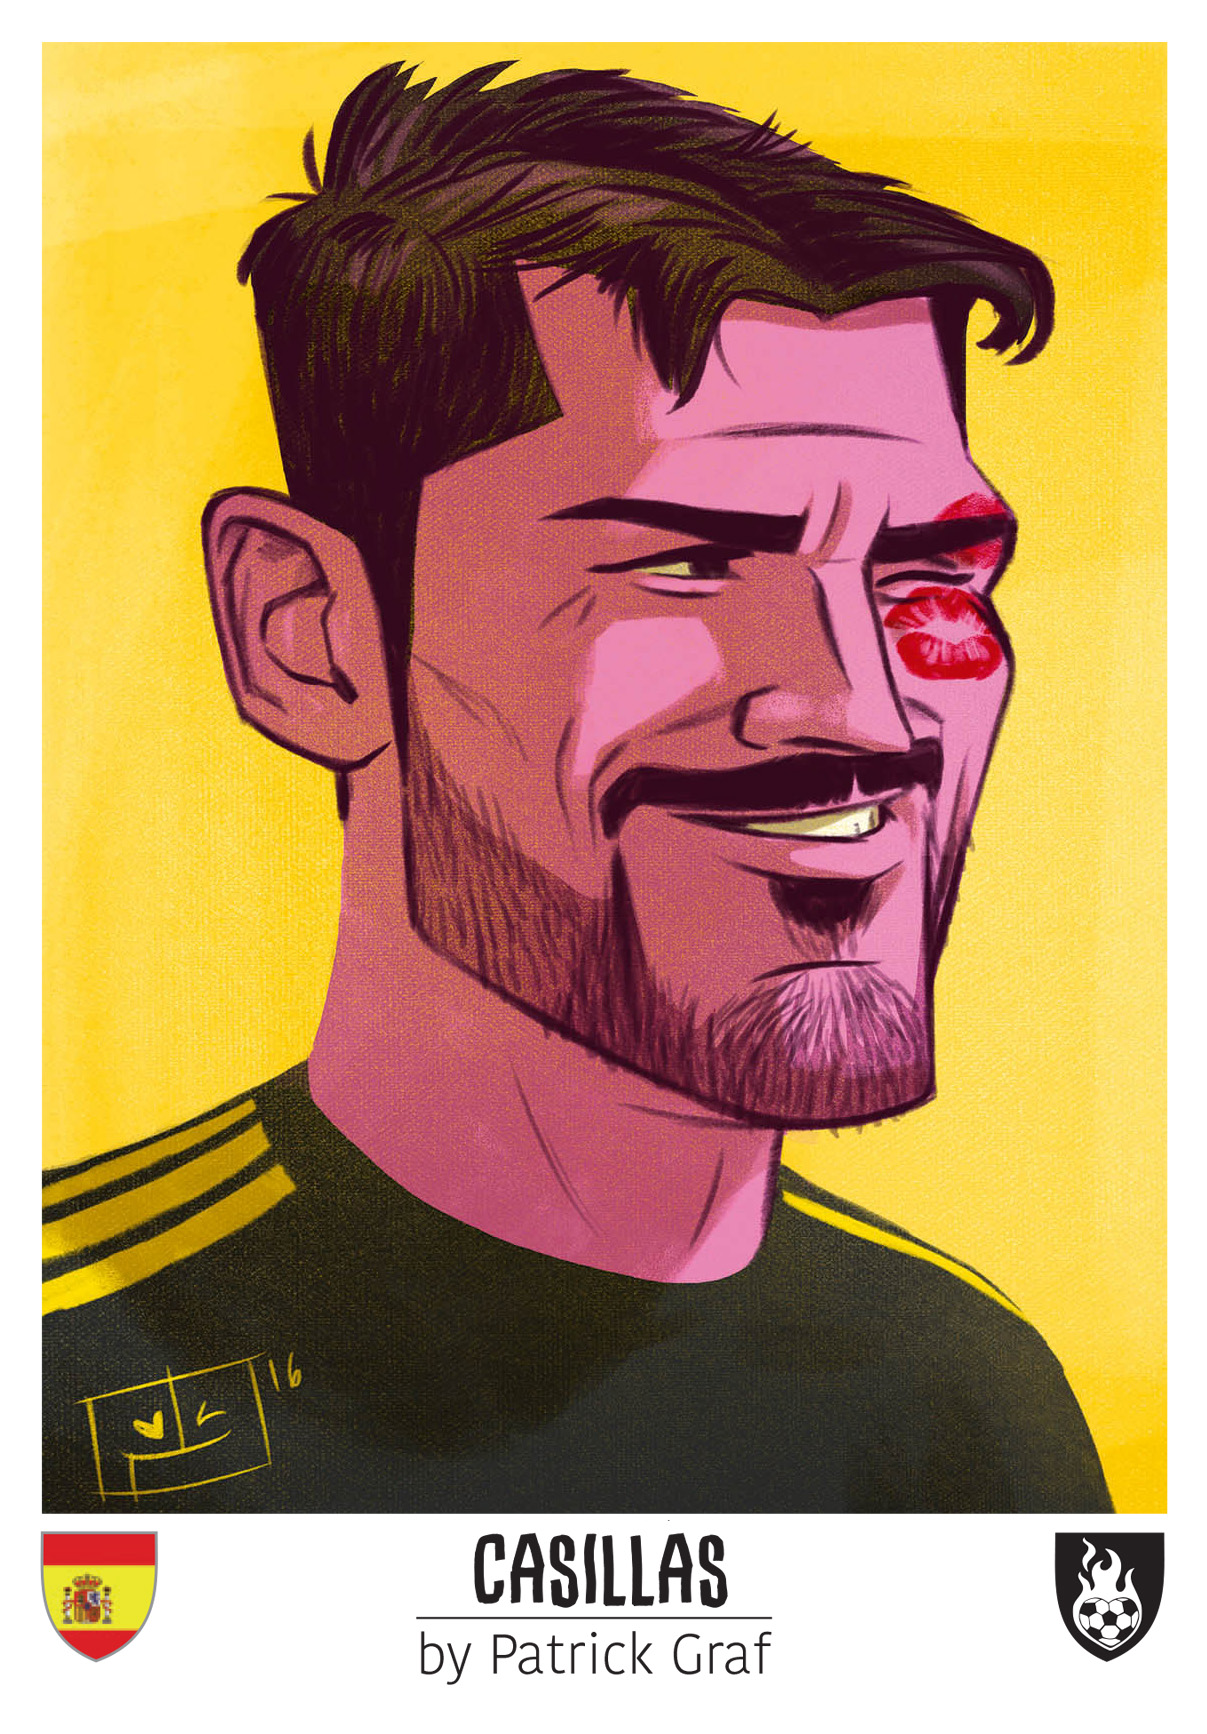 patrickgraf_Inker_Casillas_2.jpg